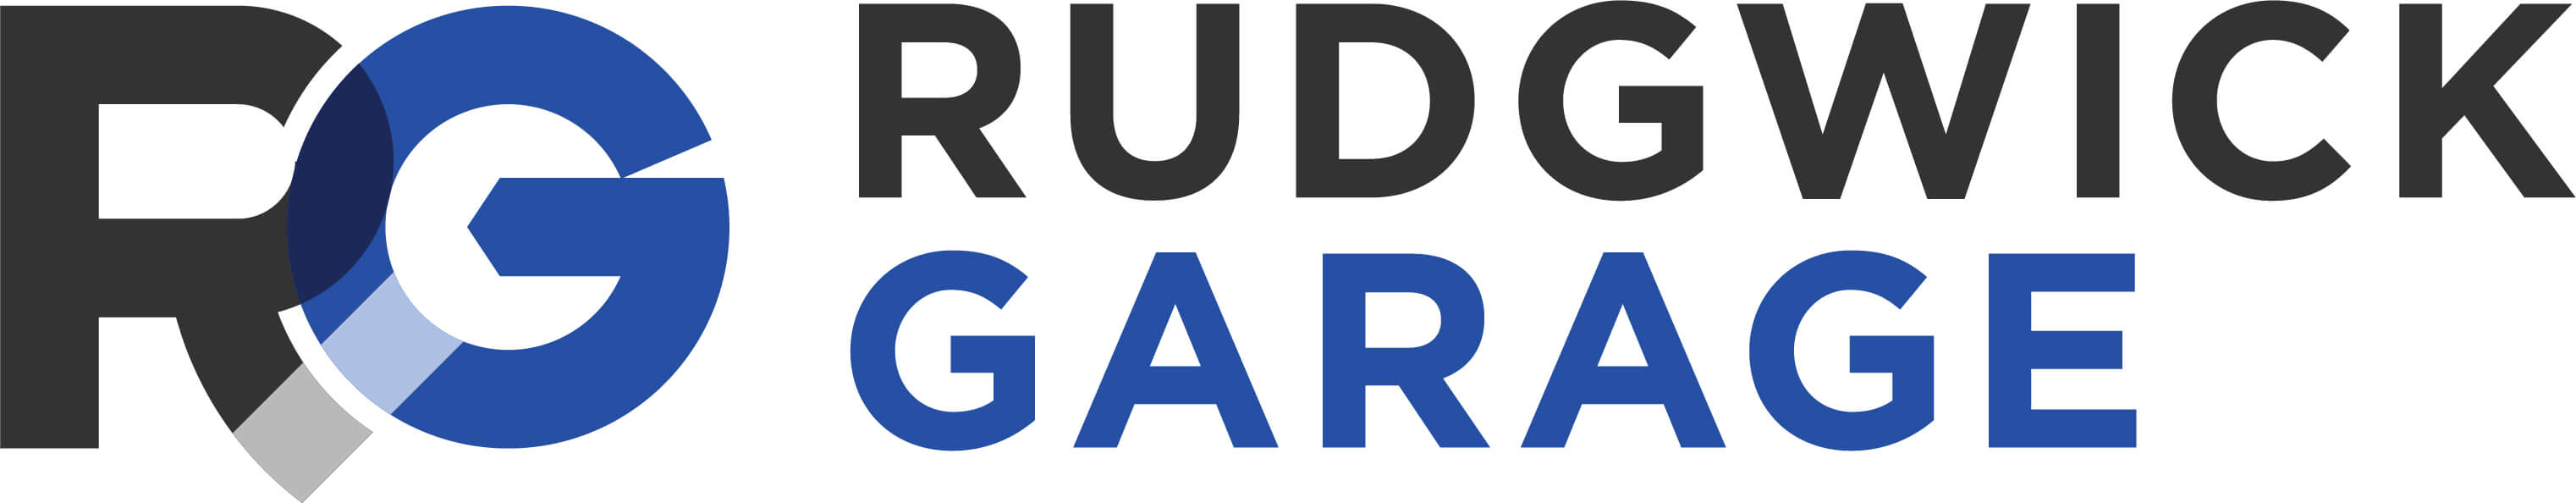 Rudgwick Garage Logo